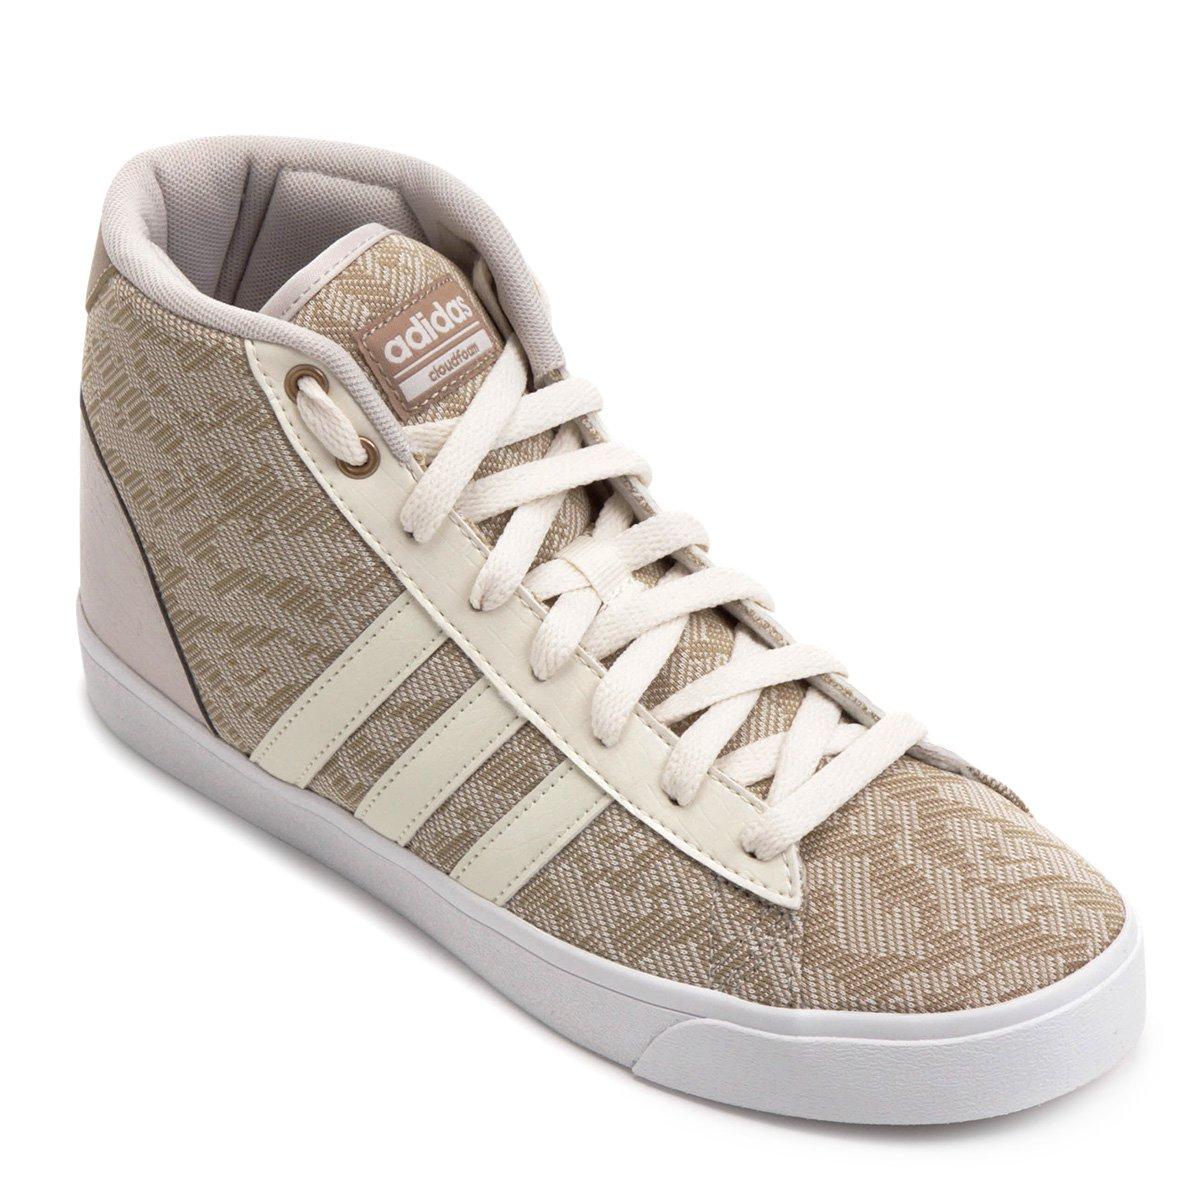 Tênis Adidas Cf Daily Qt Mid Feminino - Bege - Compre Agora  540b7f60eac52